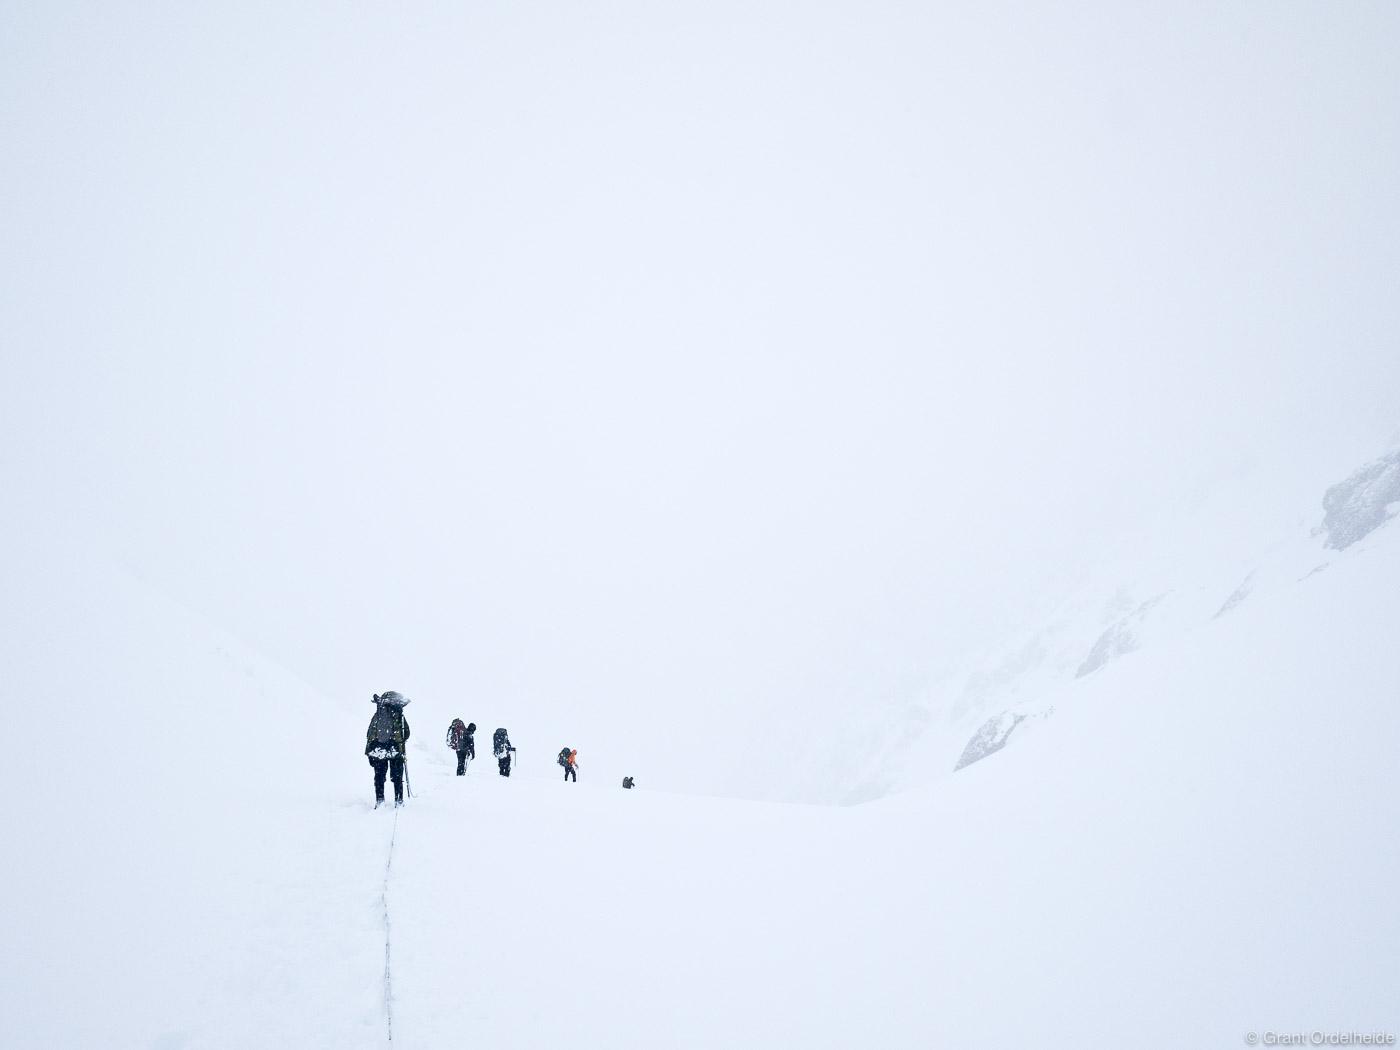 descending, cerro, castillo, national, reserve, chile, rope, team, pass, whiteout, storm, photo